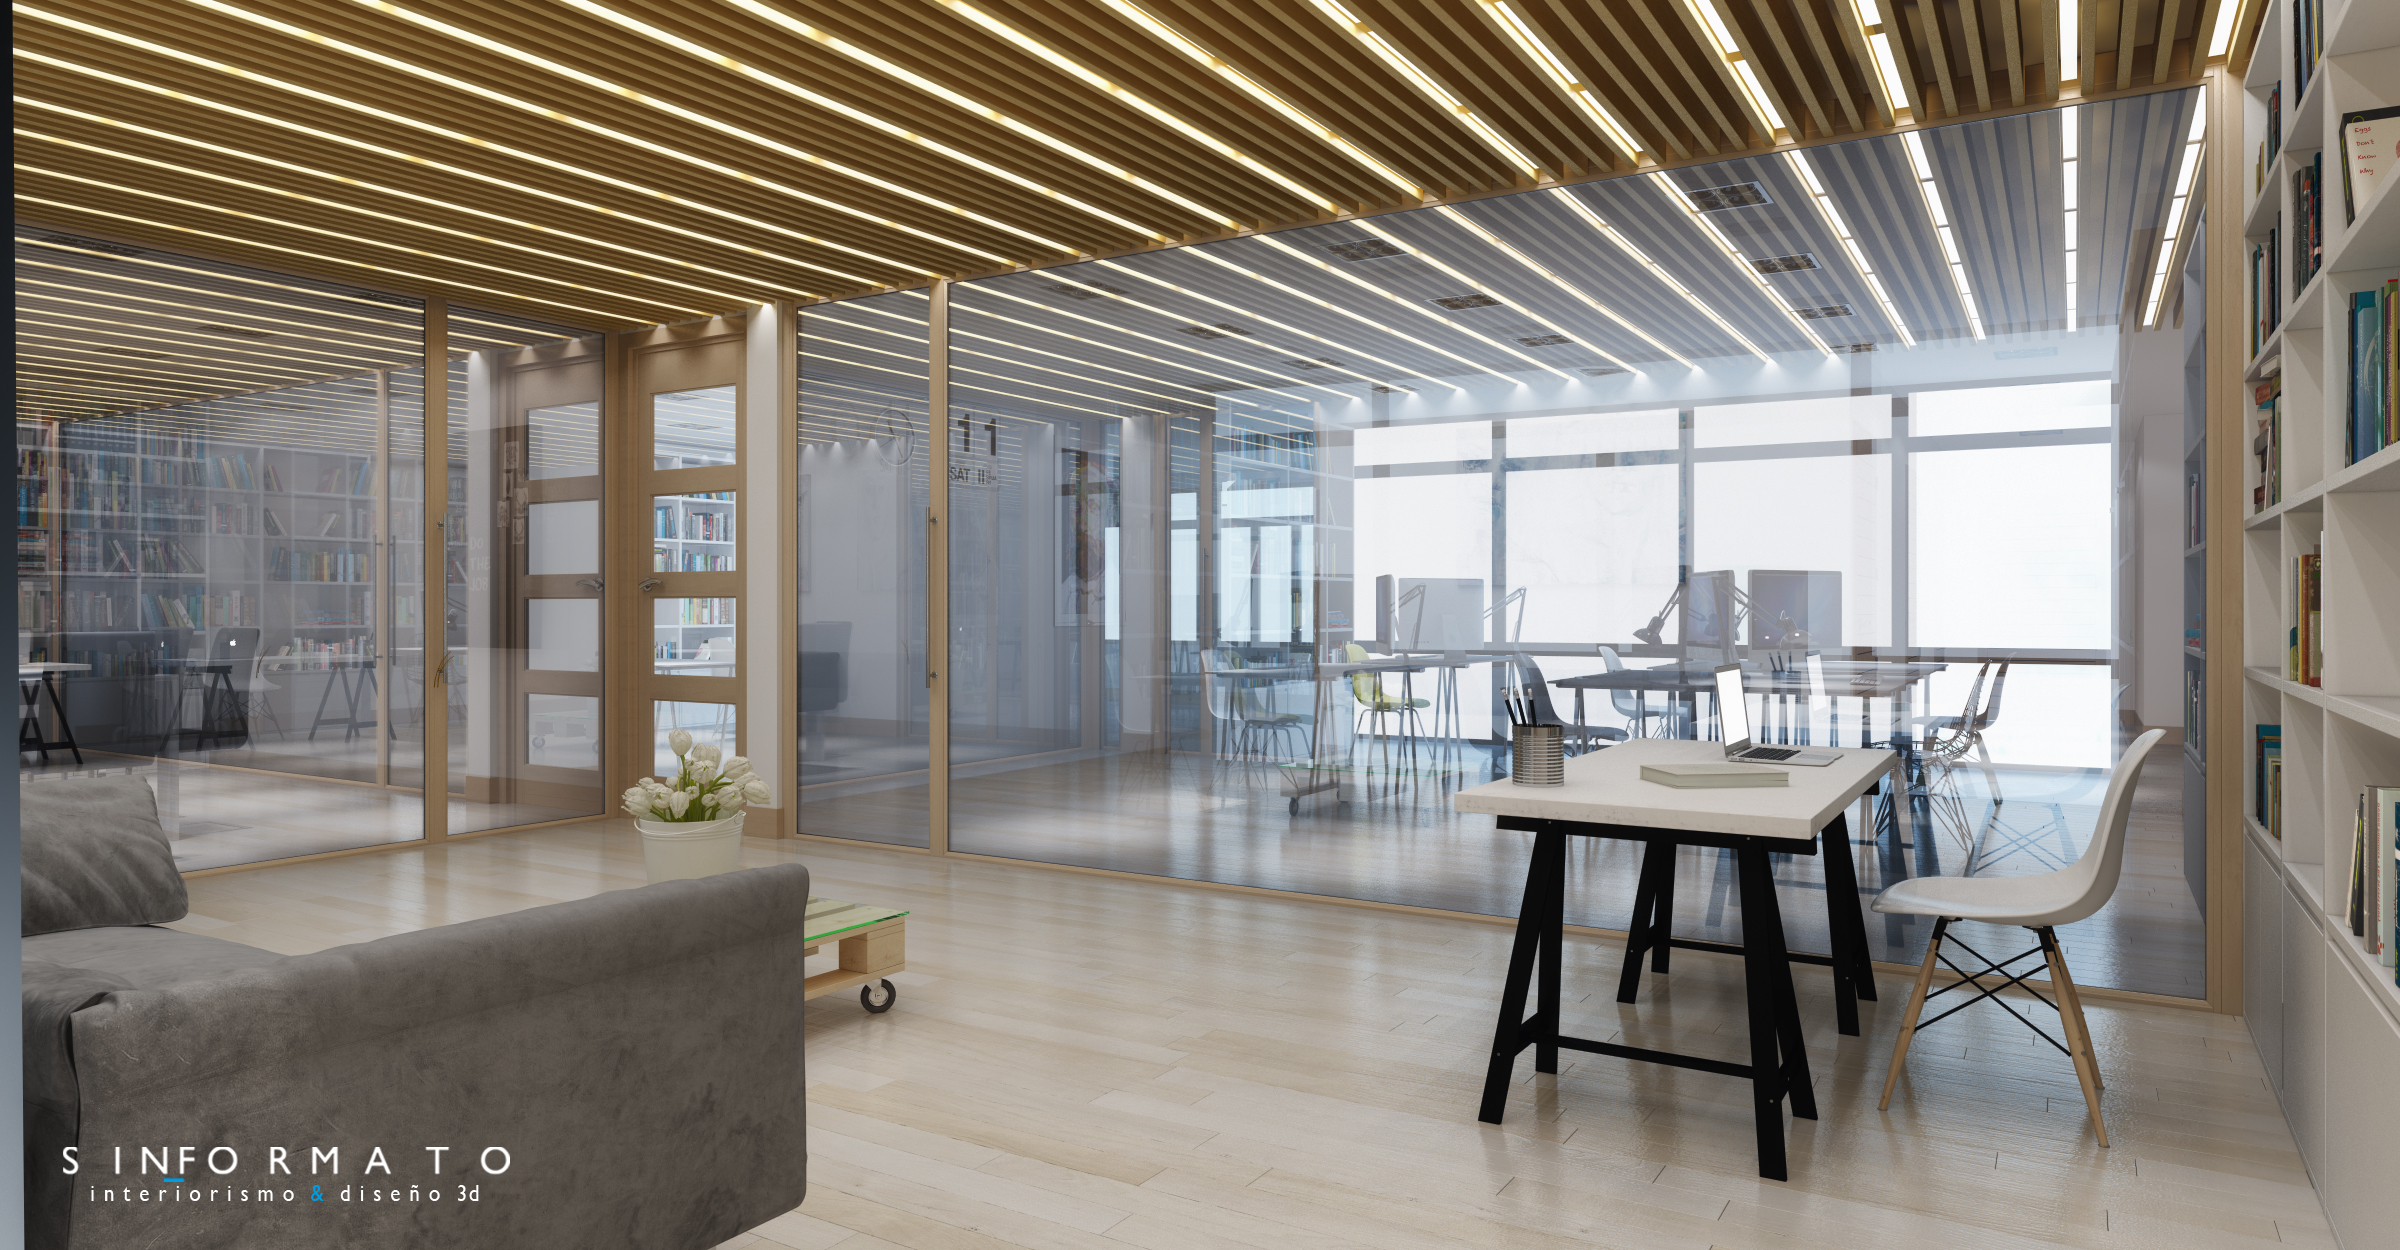 Interiorismo 3d oficinas edinco sin formato for Oficinas ibercaja burgos